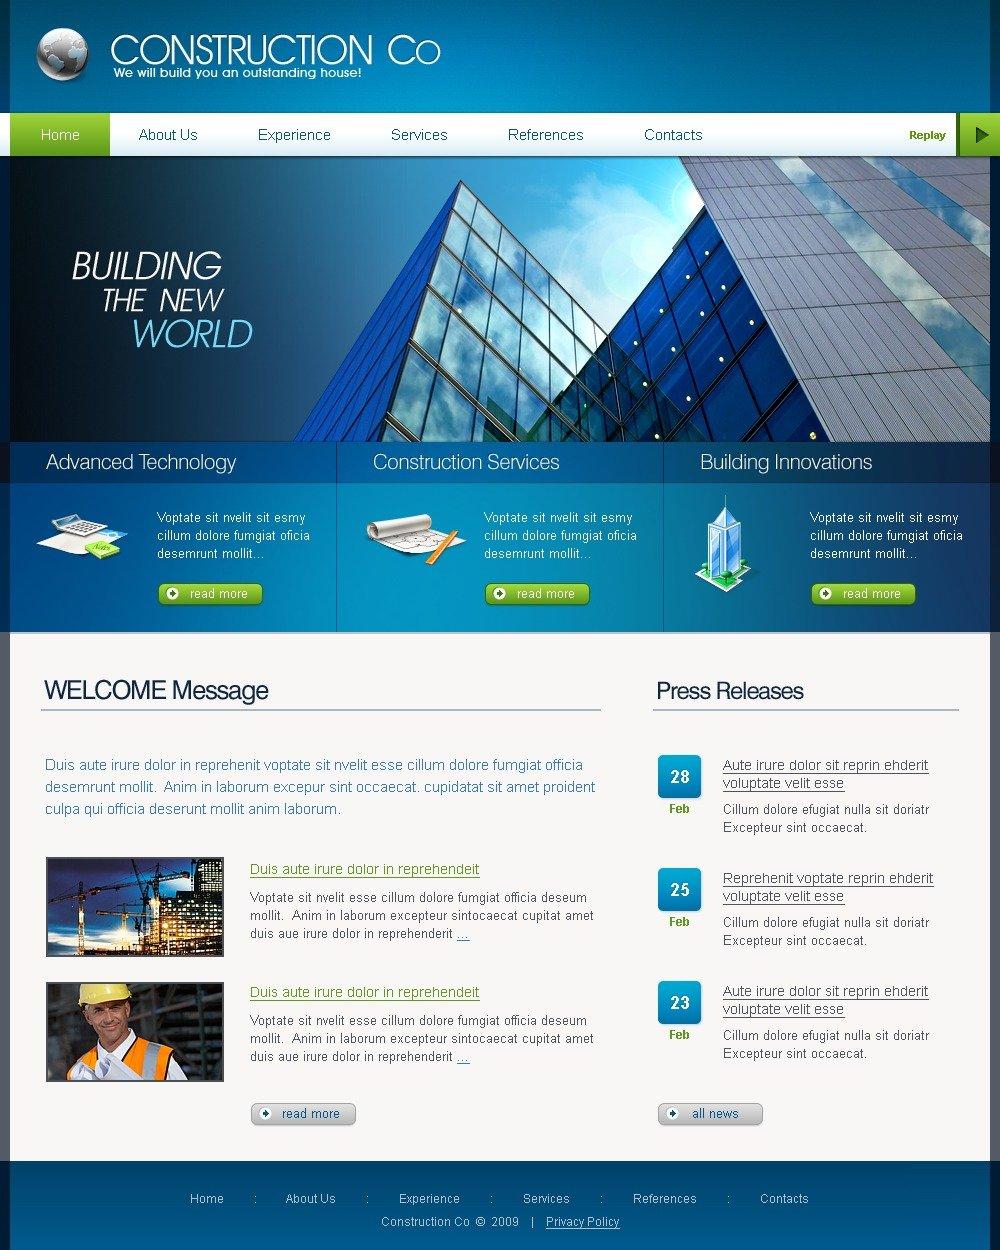 construction company website template 25195. Black Bedroom Furniture Sets. Home Design Ideas